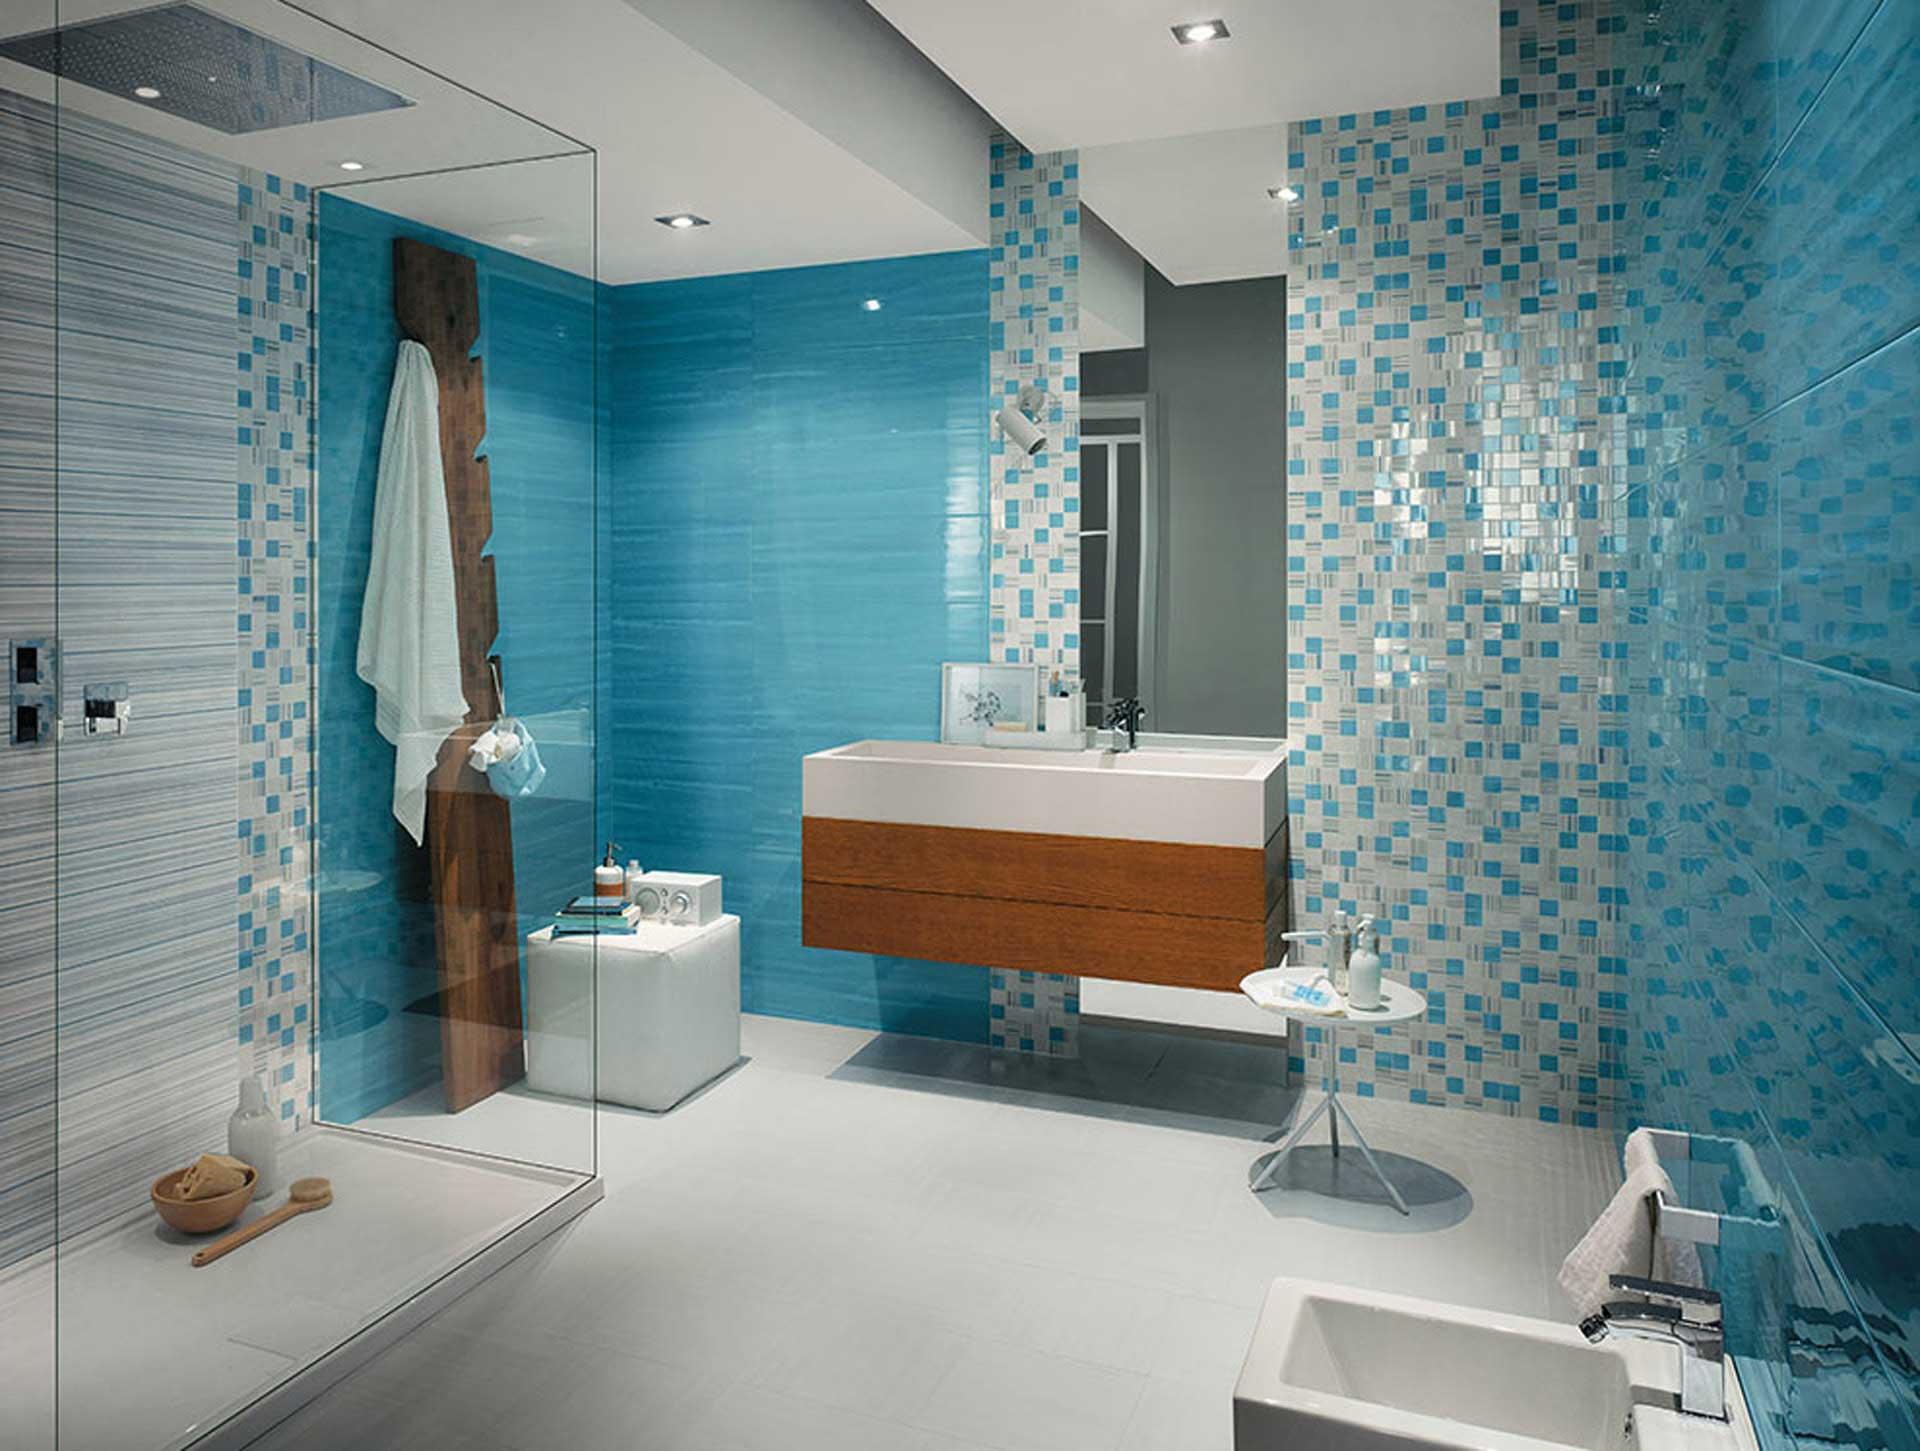 Piastrelle bagno mosaico verde piastrella mosaico bagnocucina in